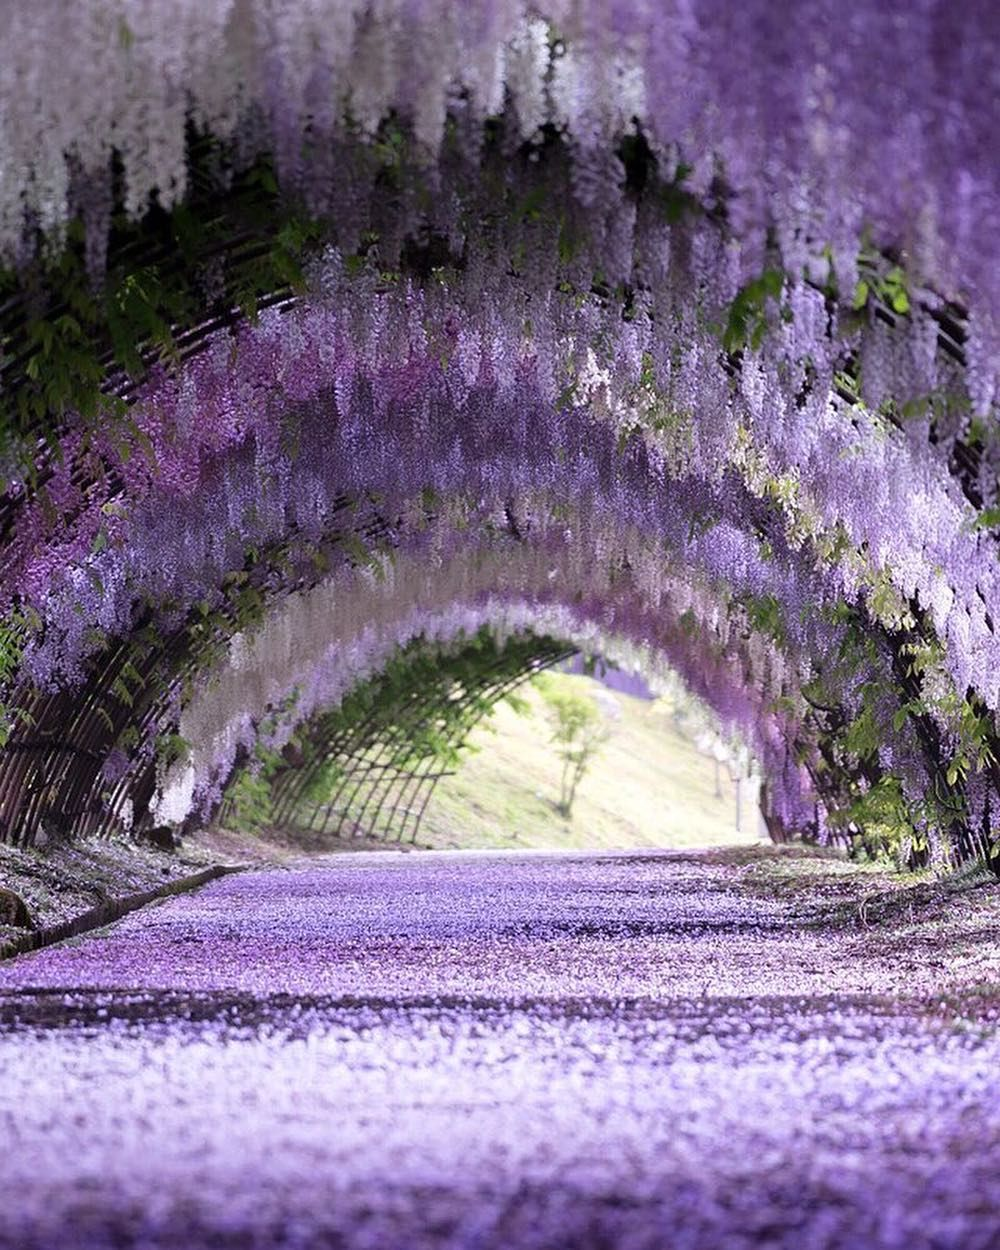 f254136aff1703fc254a4b2efcadf5cf - Wisteria Tunnel At Kawachi Fuji Gardens Kitakyushu Japan